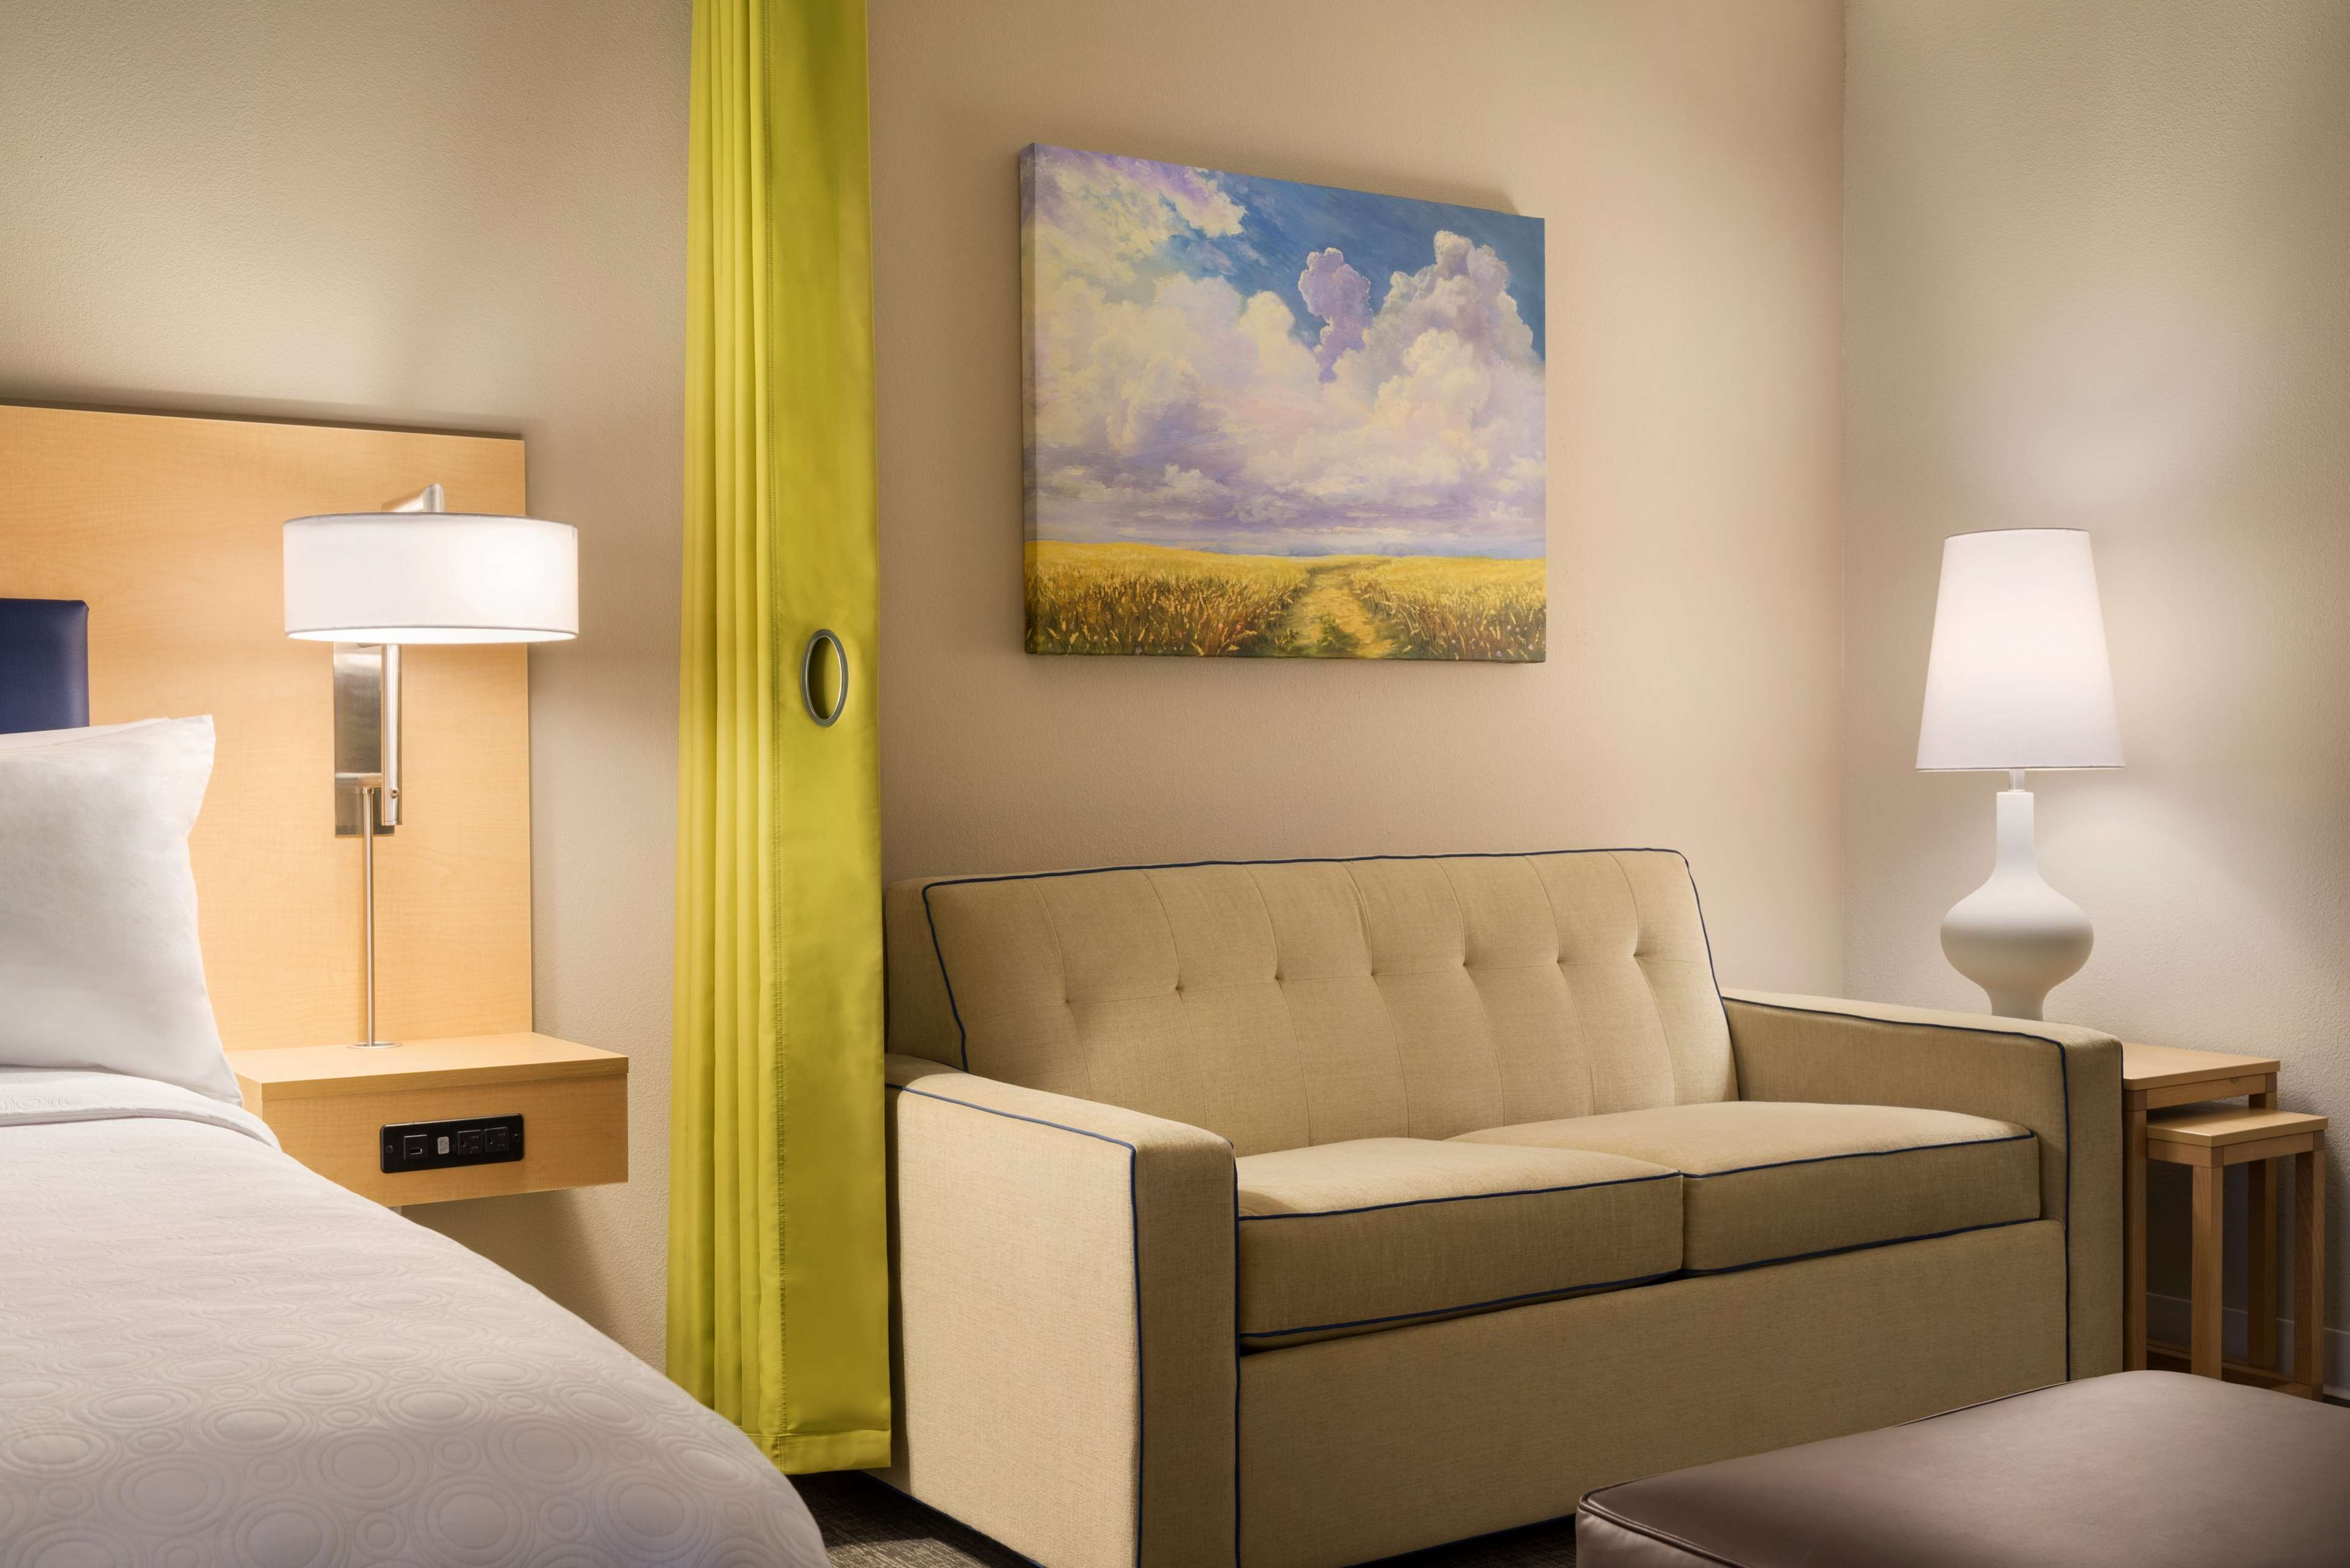 Home2 Suites by Hilton Leavenworth Downtown image 30